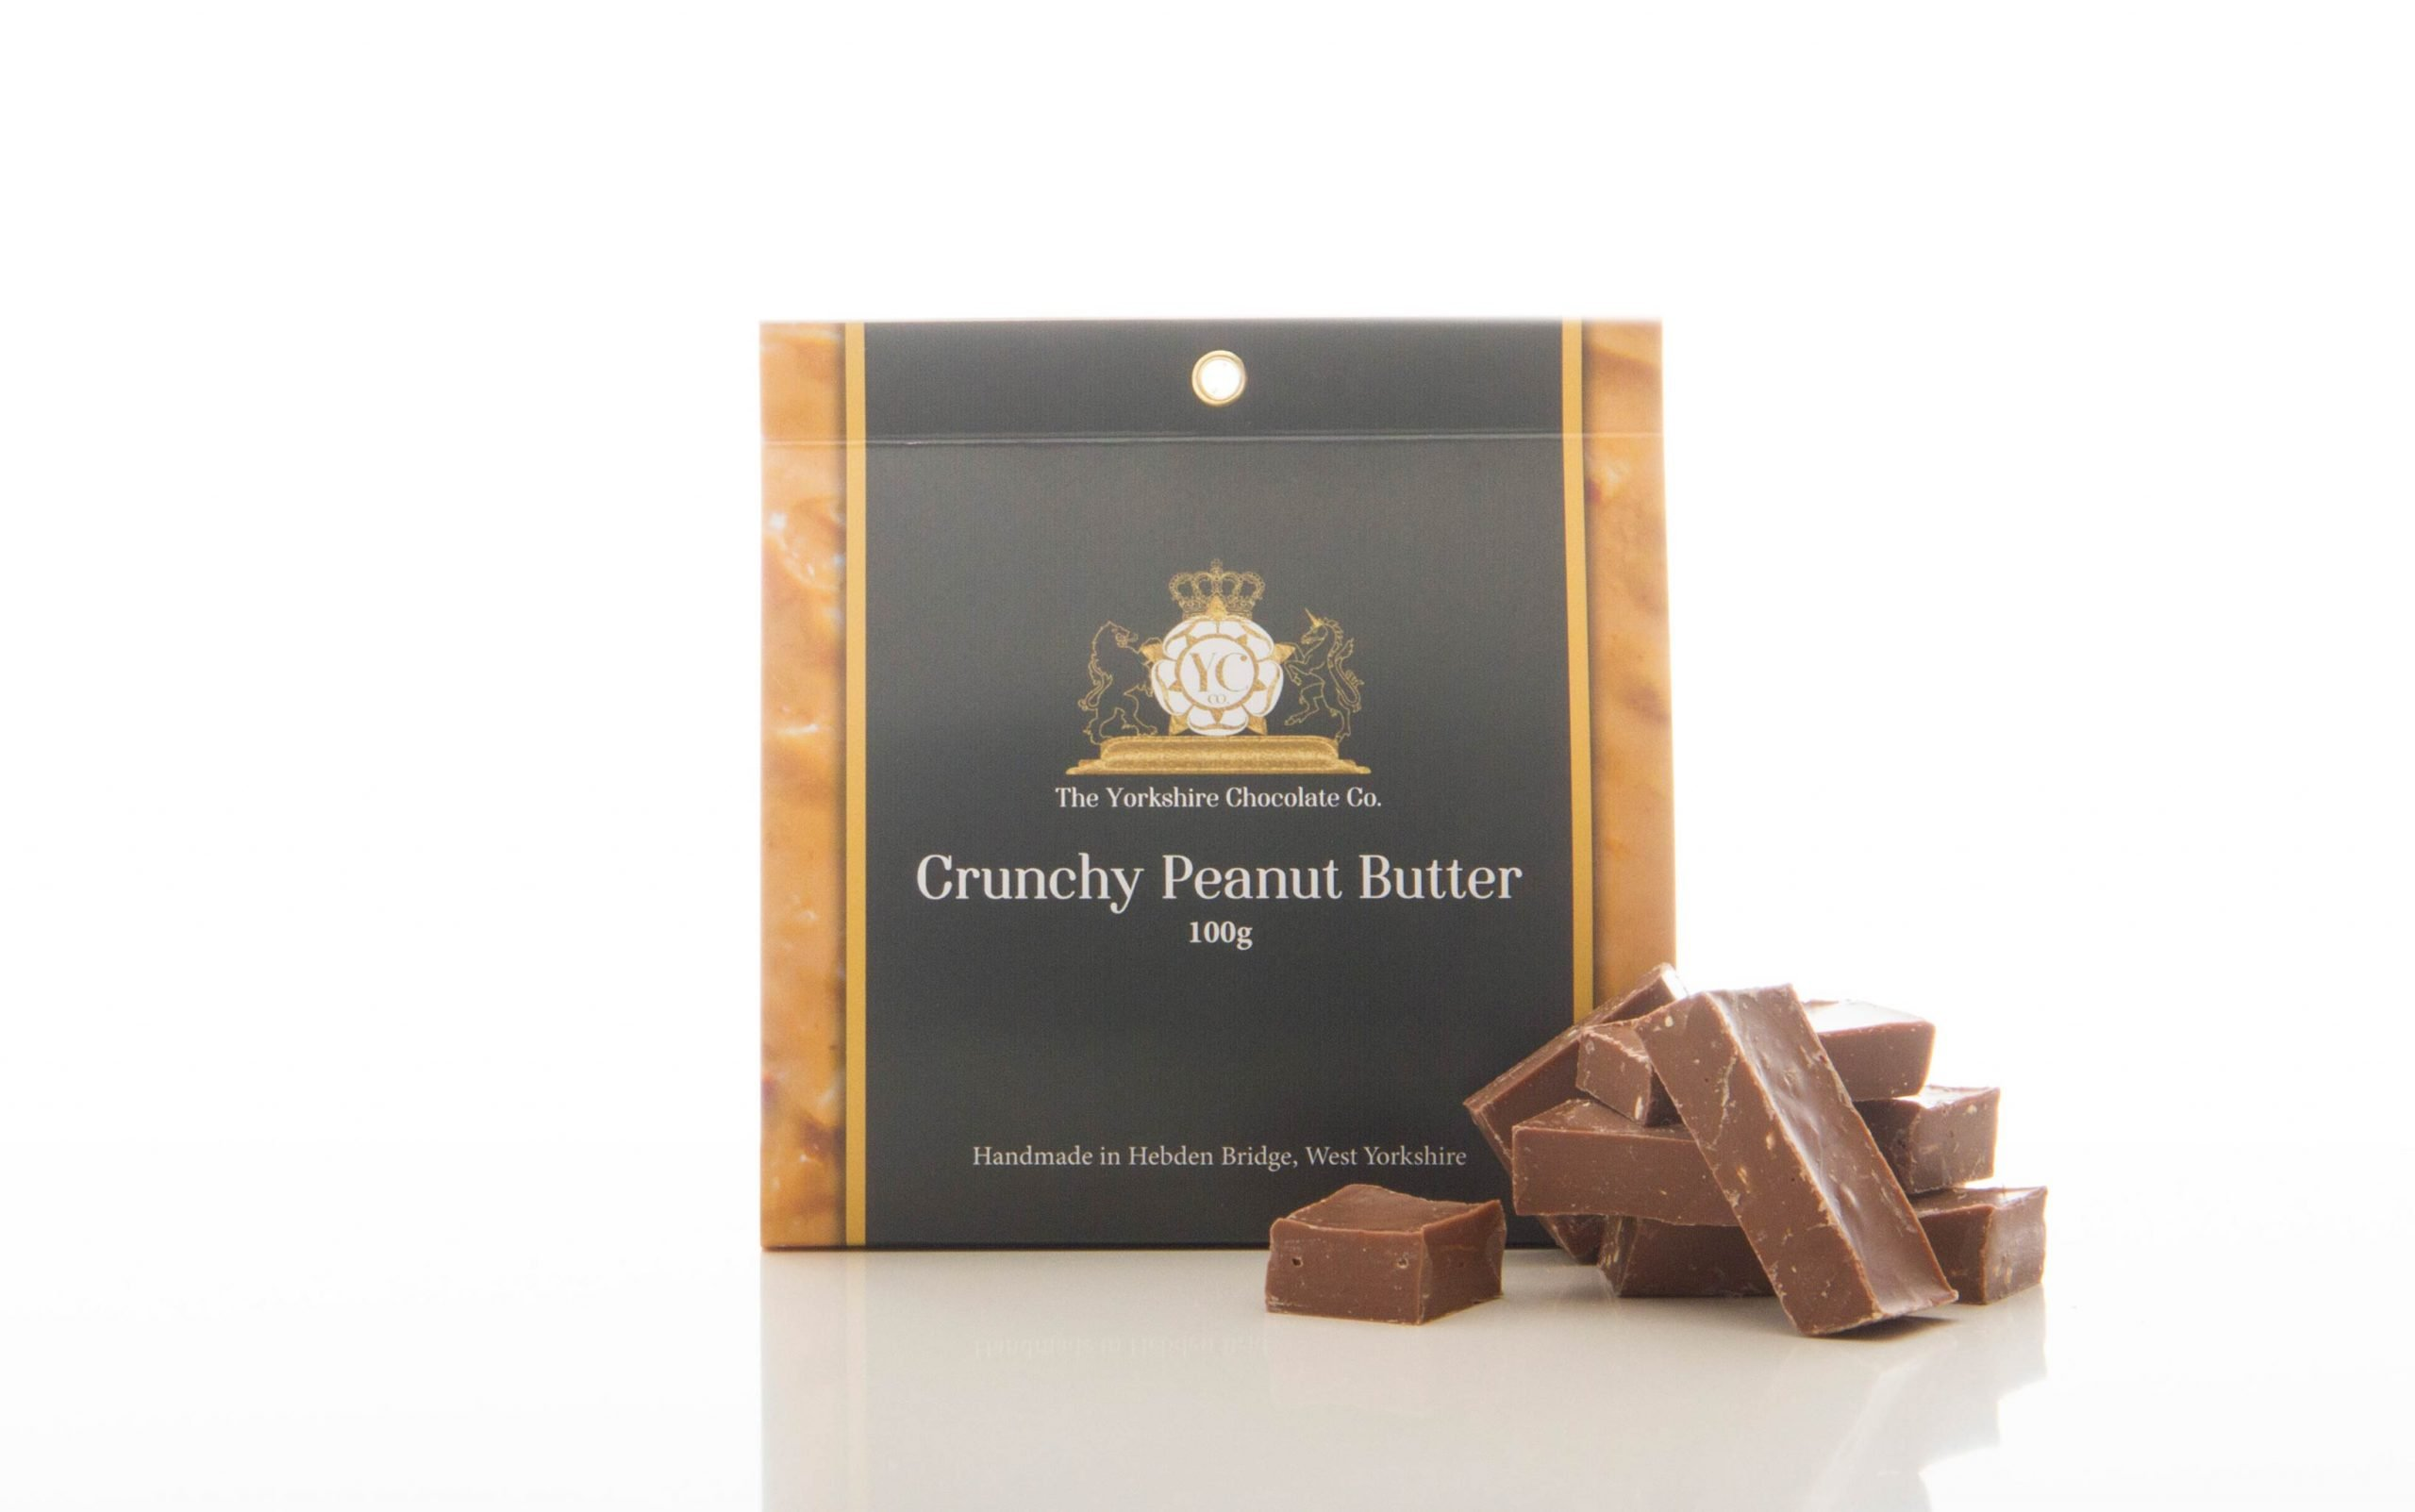 Box of Crunchy Peanut Butter Chocolate